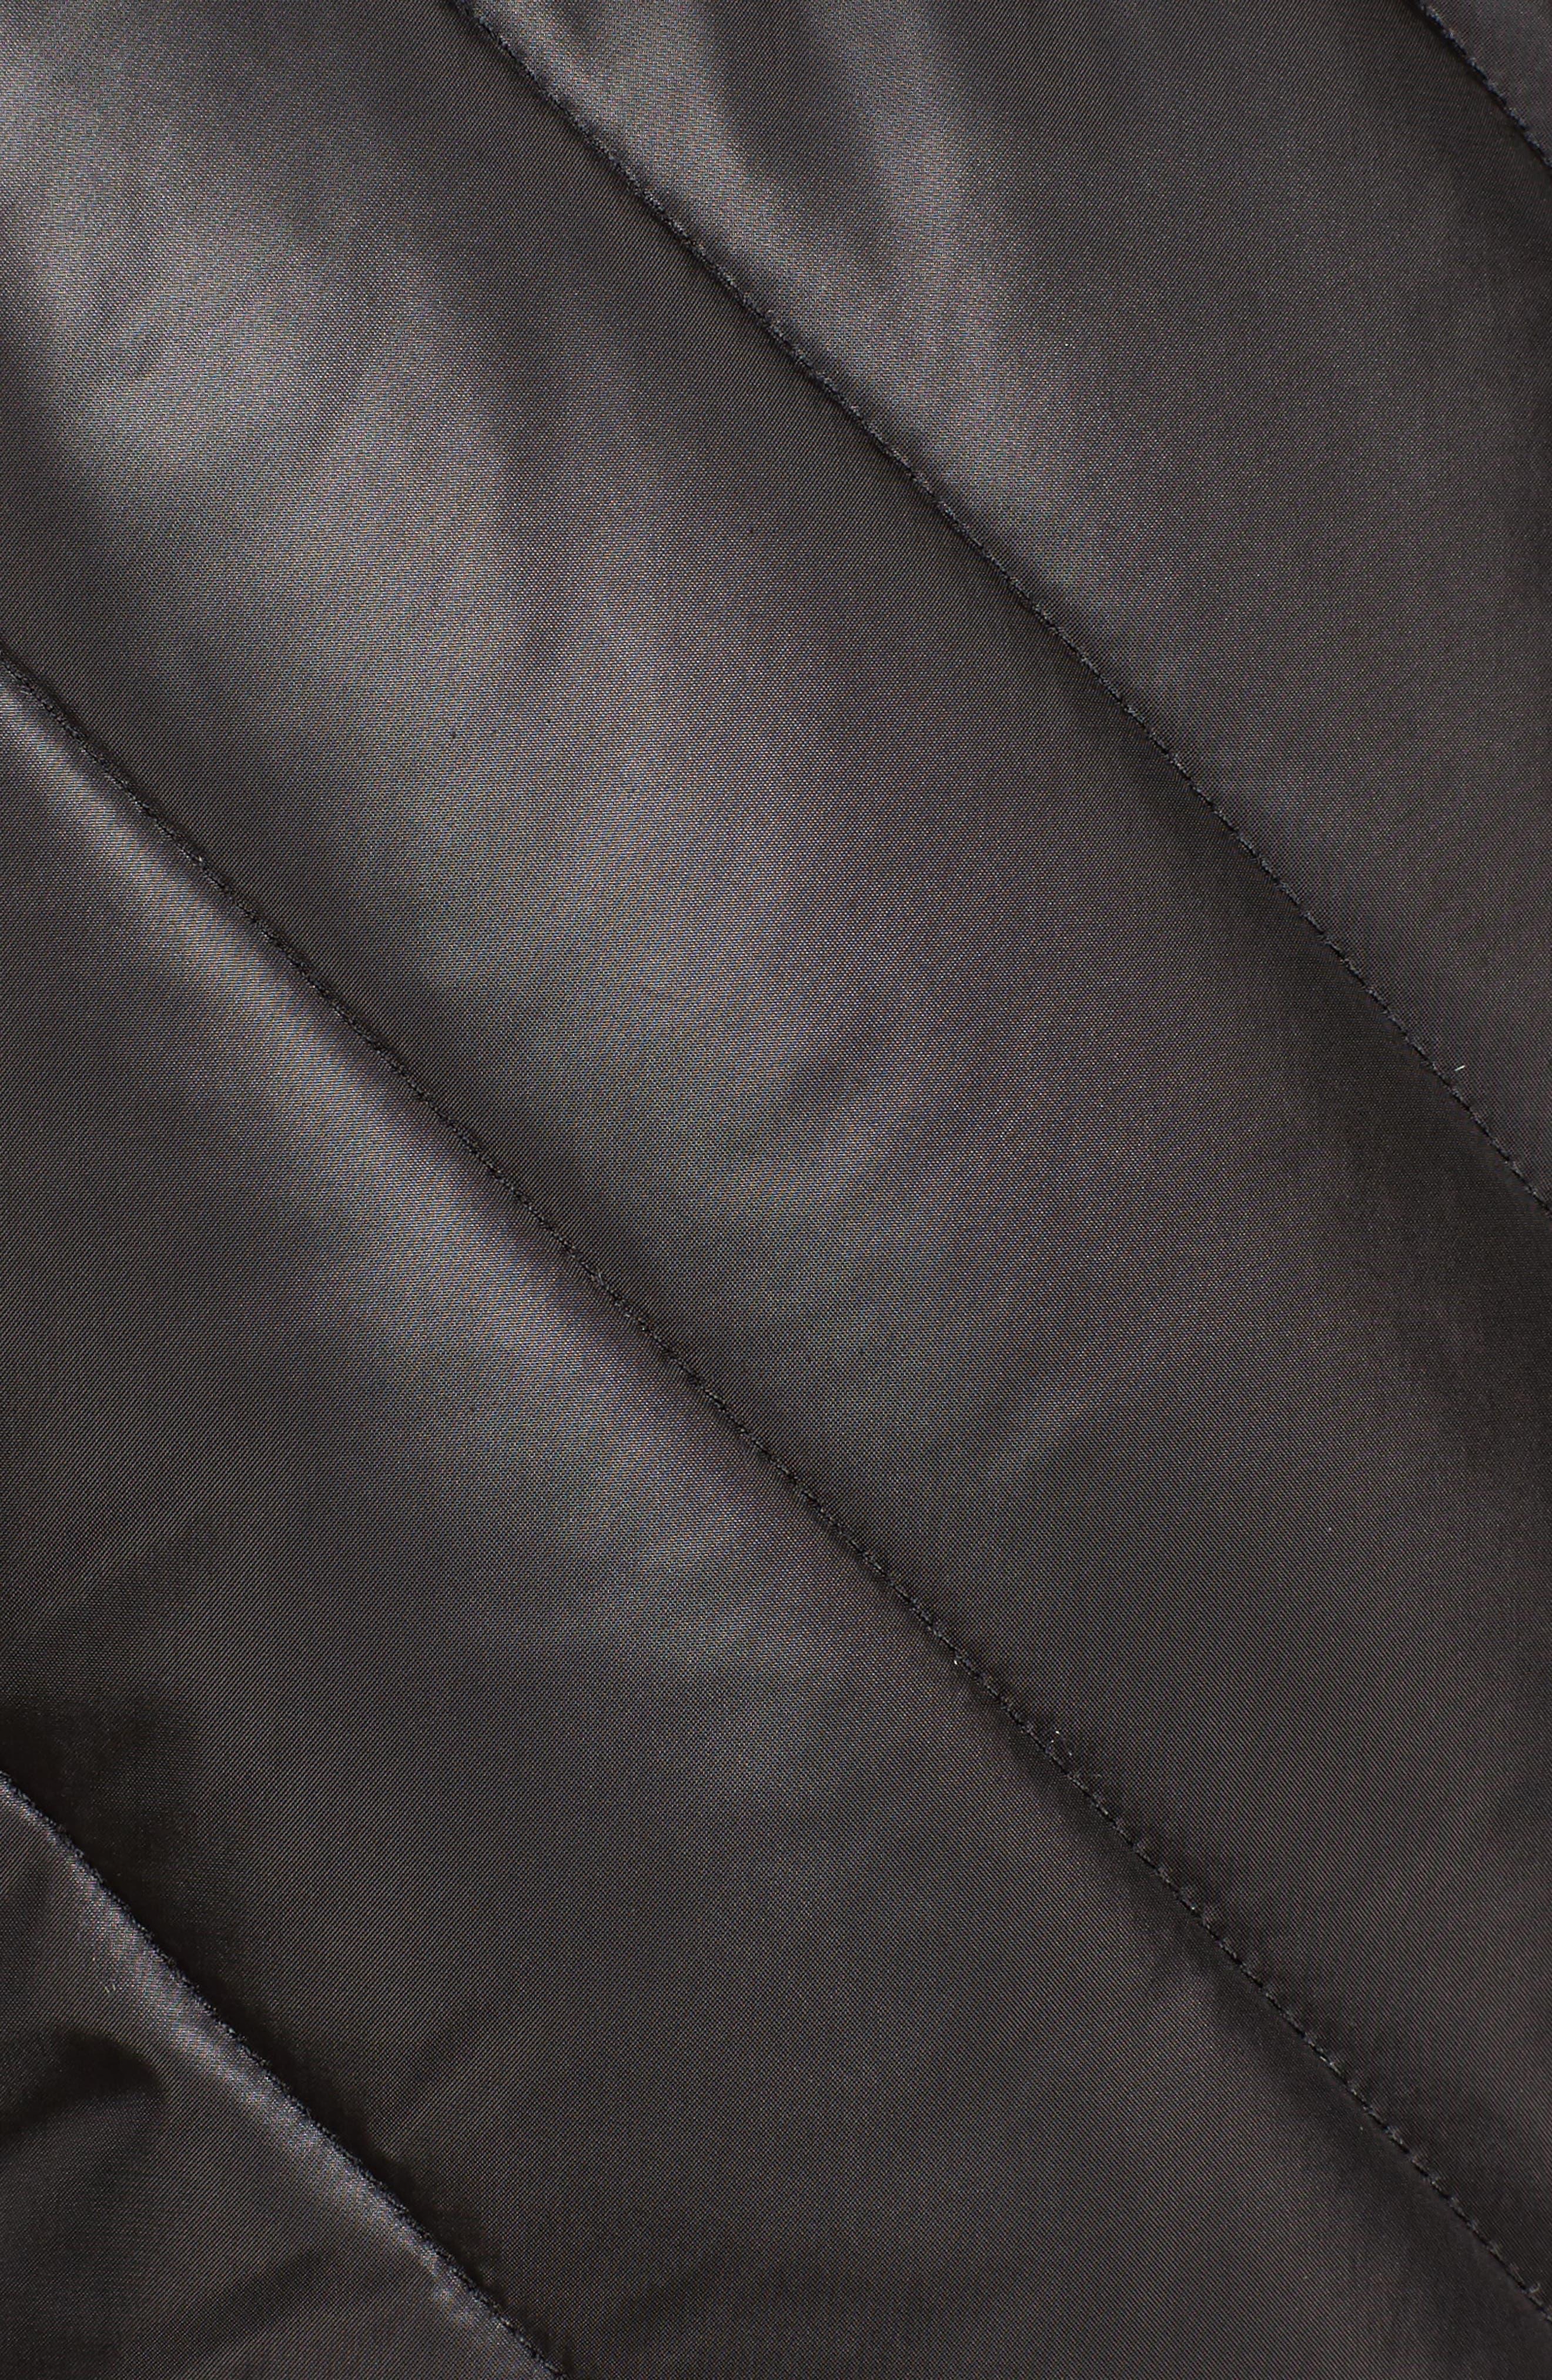 Merino Wool Trim Puffer Vest,                             Alternate thumbnail 6, color,                             001